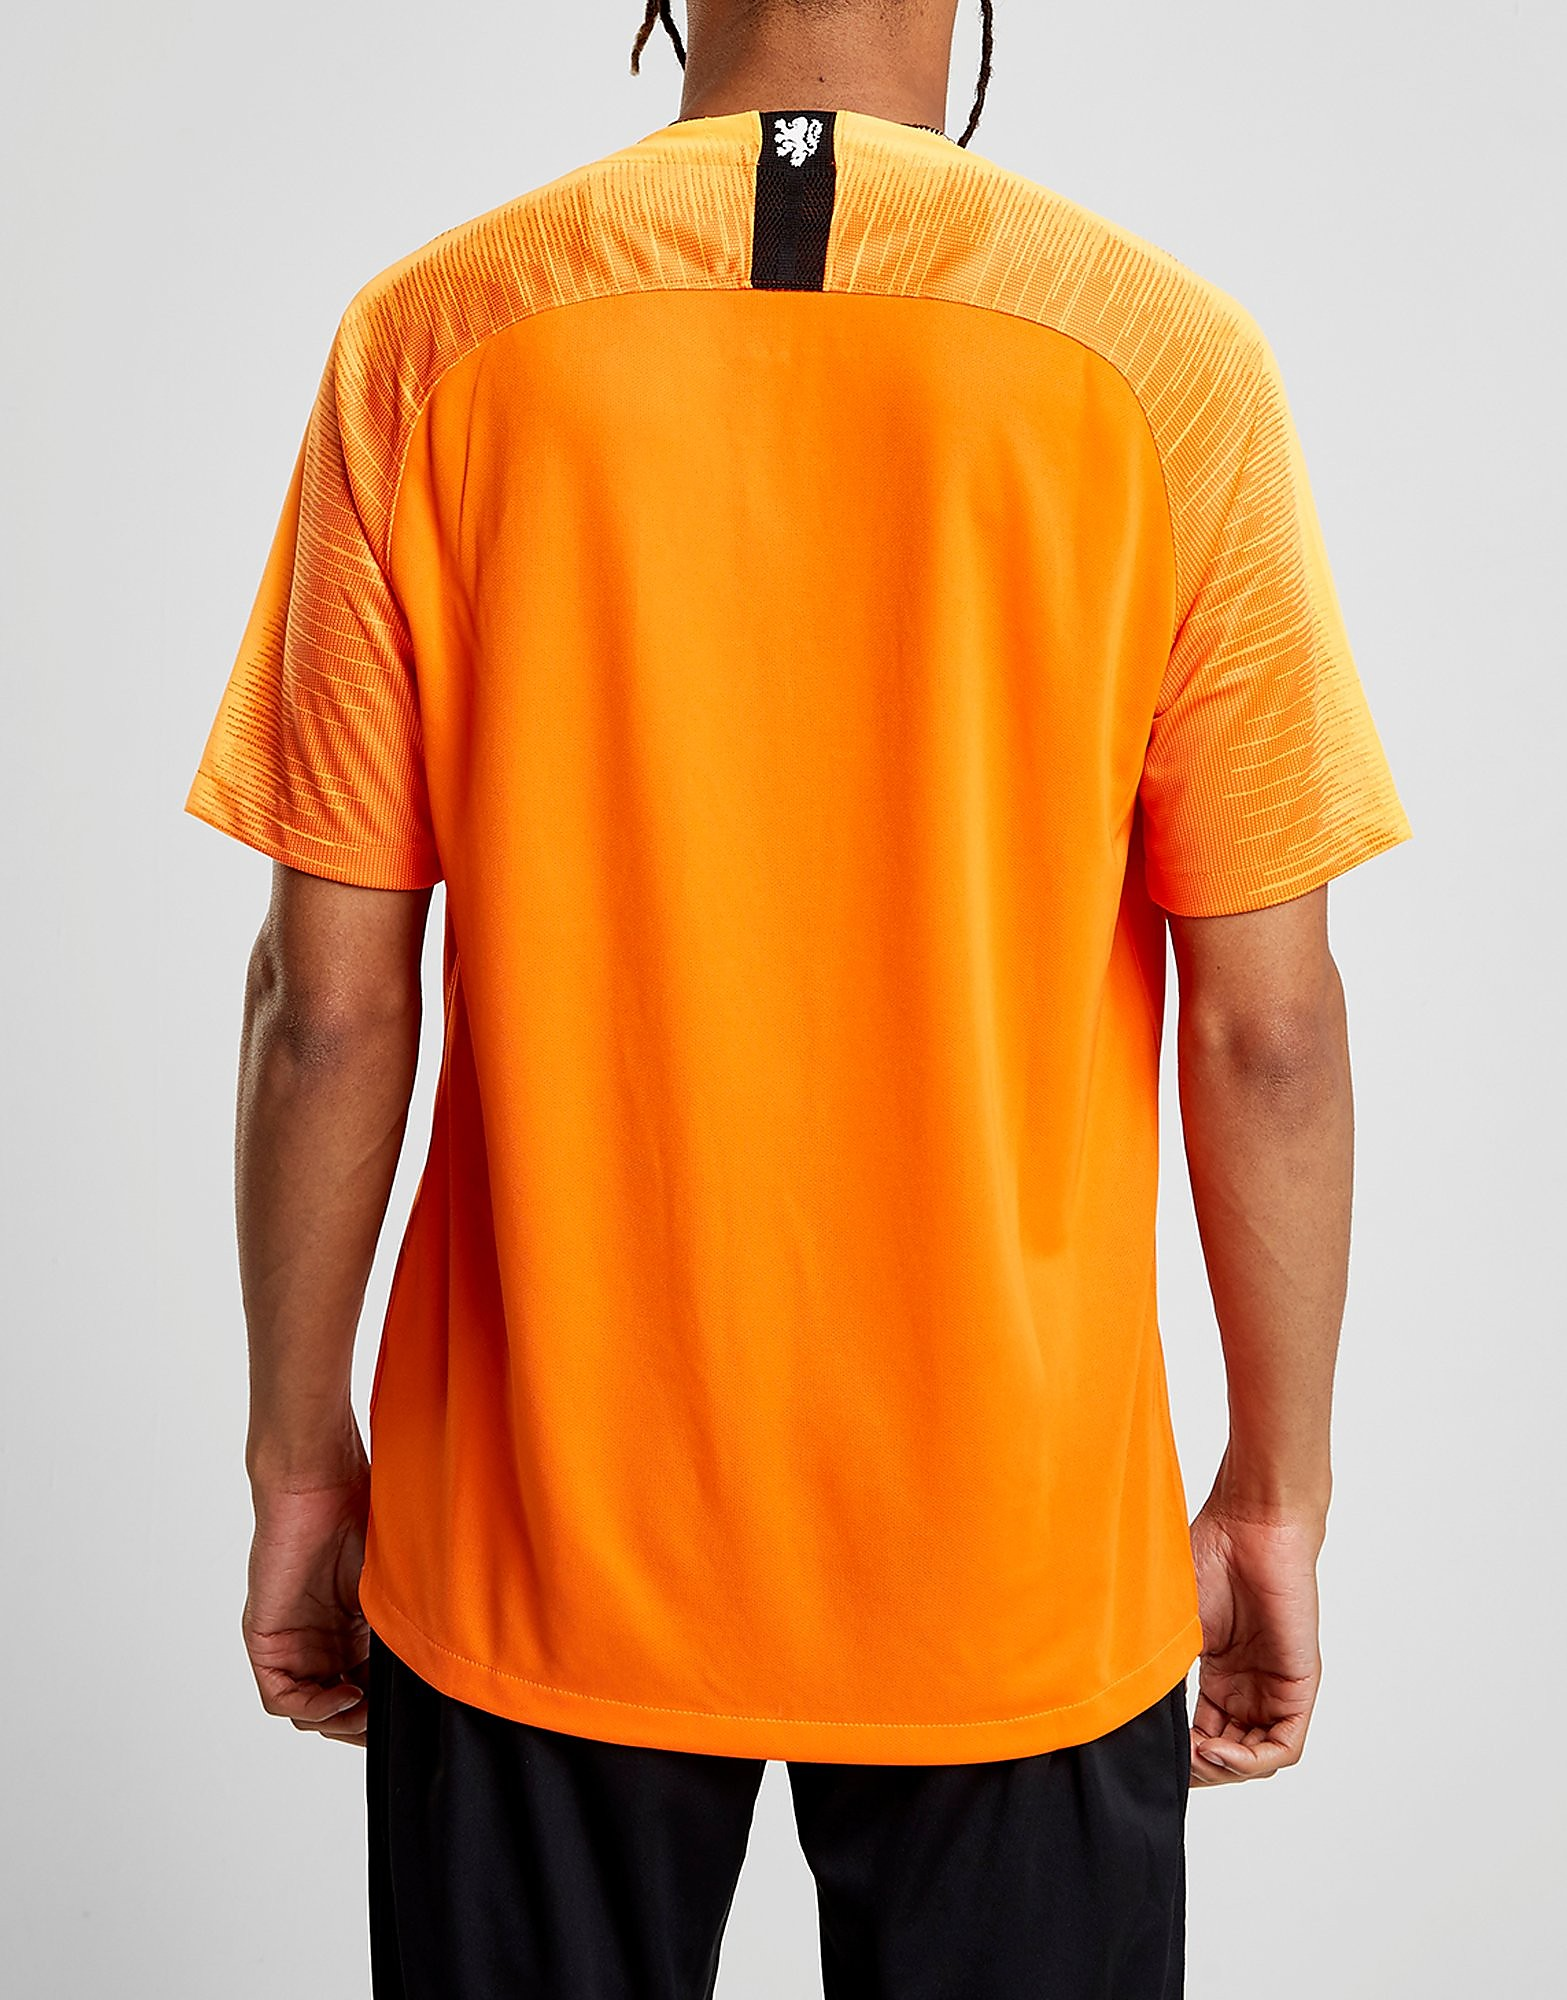 Nike Holland 2018 Home Shirt PRE ORDER